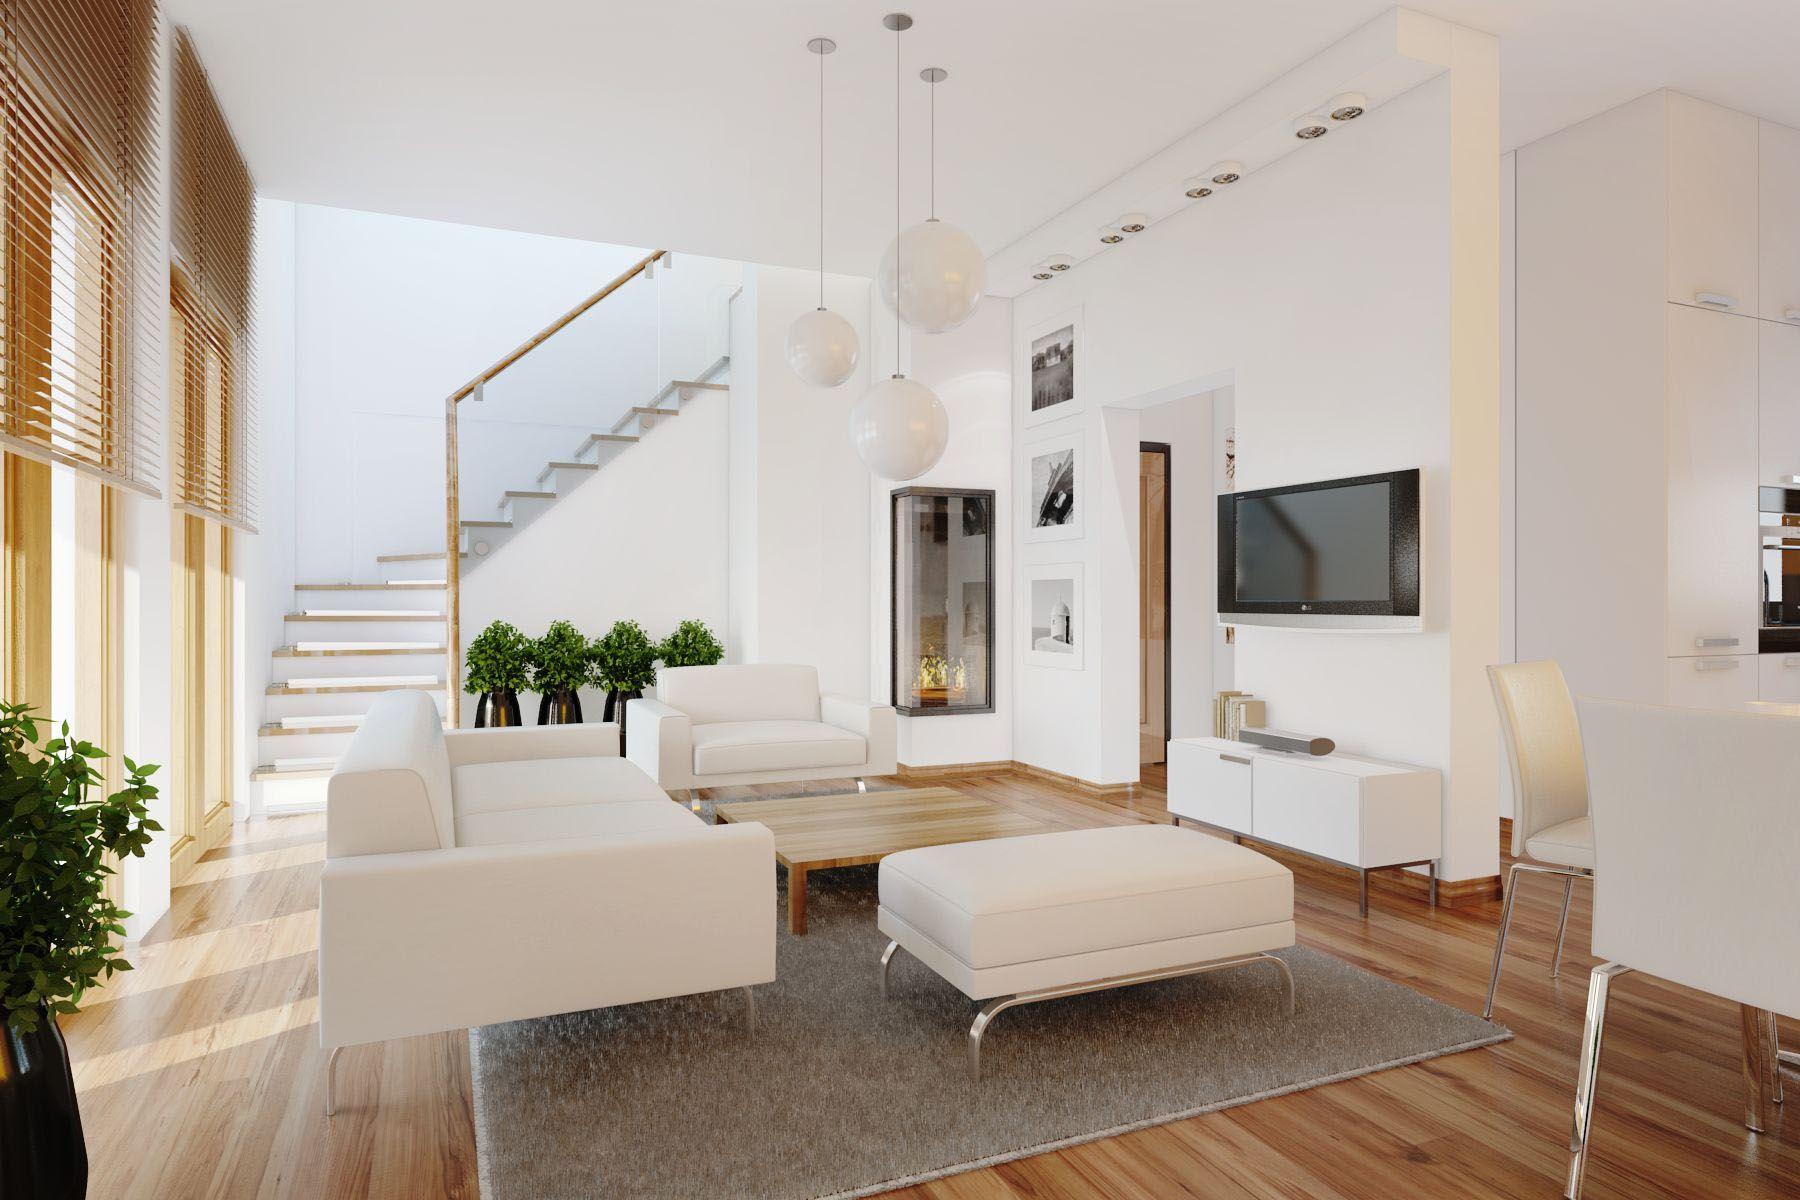 interior design room plan - 1000+ images about Oturma Odası asarım / Living oom Design on ...